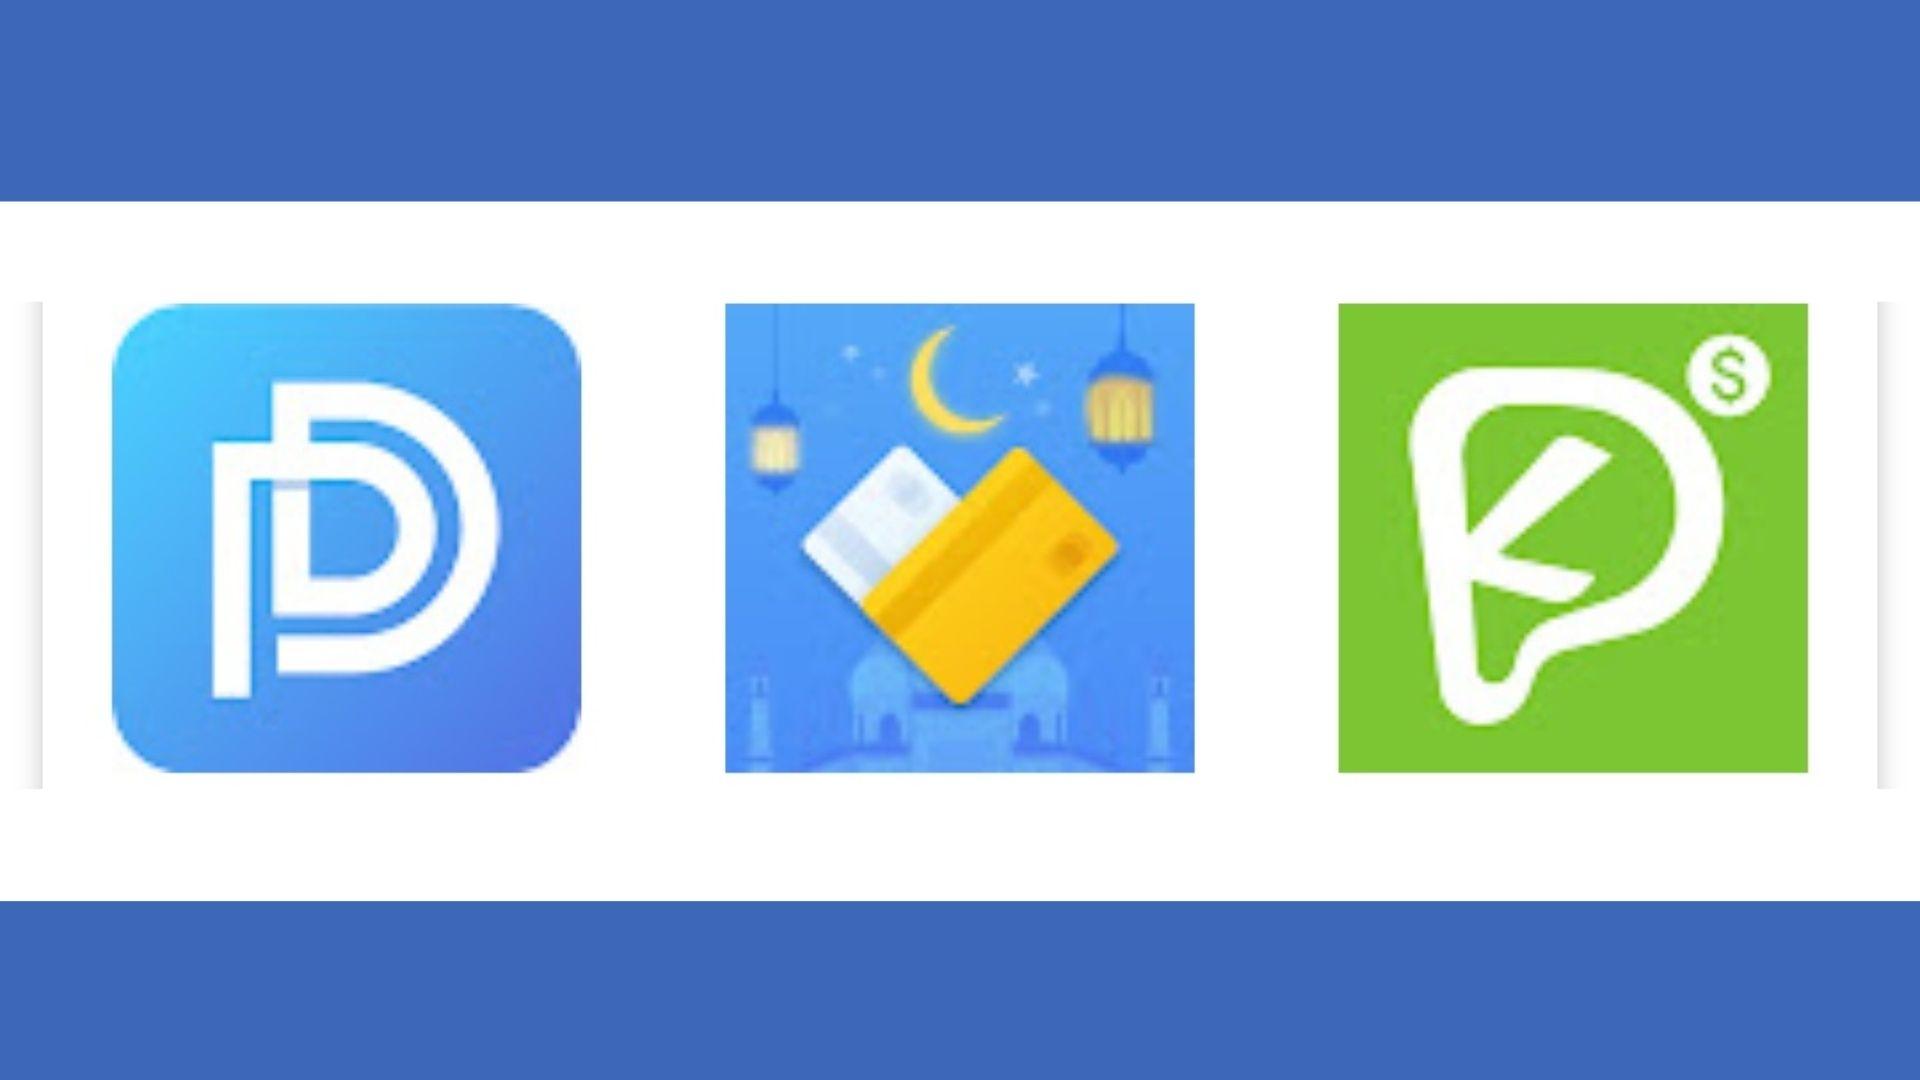 Aplikasi Pinjaman Online Tanpa Slip Gaji Terpopuler Yang Paling Gampang Cair Warna Biru Finansial Kta Kredit Pinjaman Online P Aplikasi Pinjaman Populer